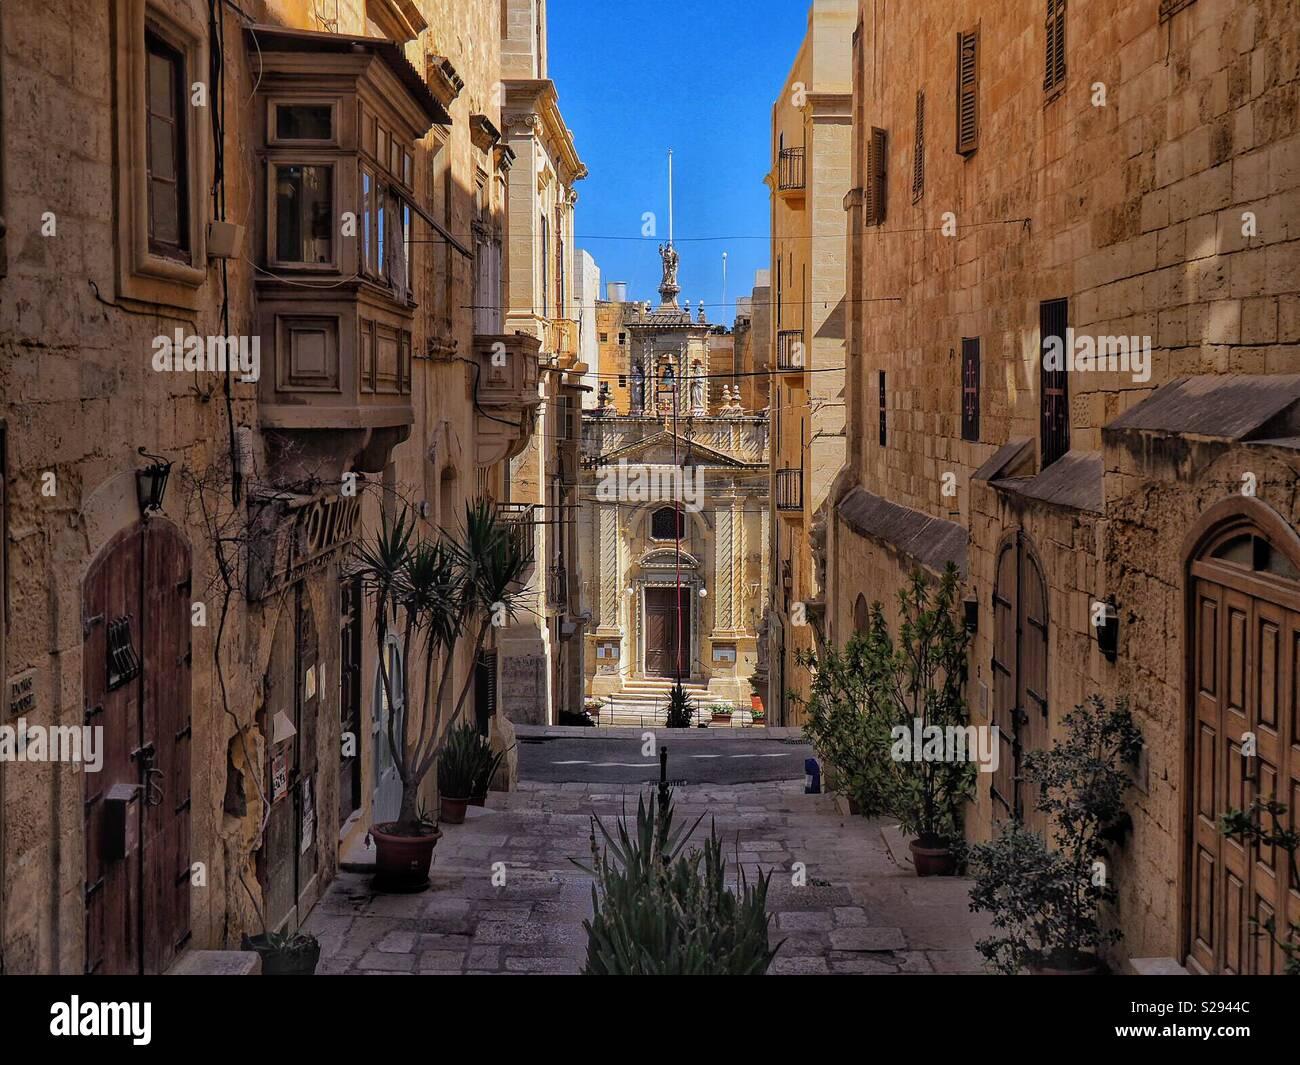 Quiet street of Valletta Old Town in Malta - Stock Image